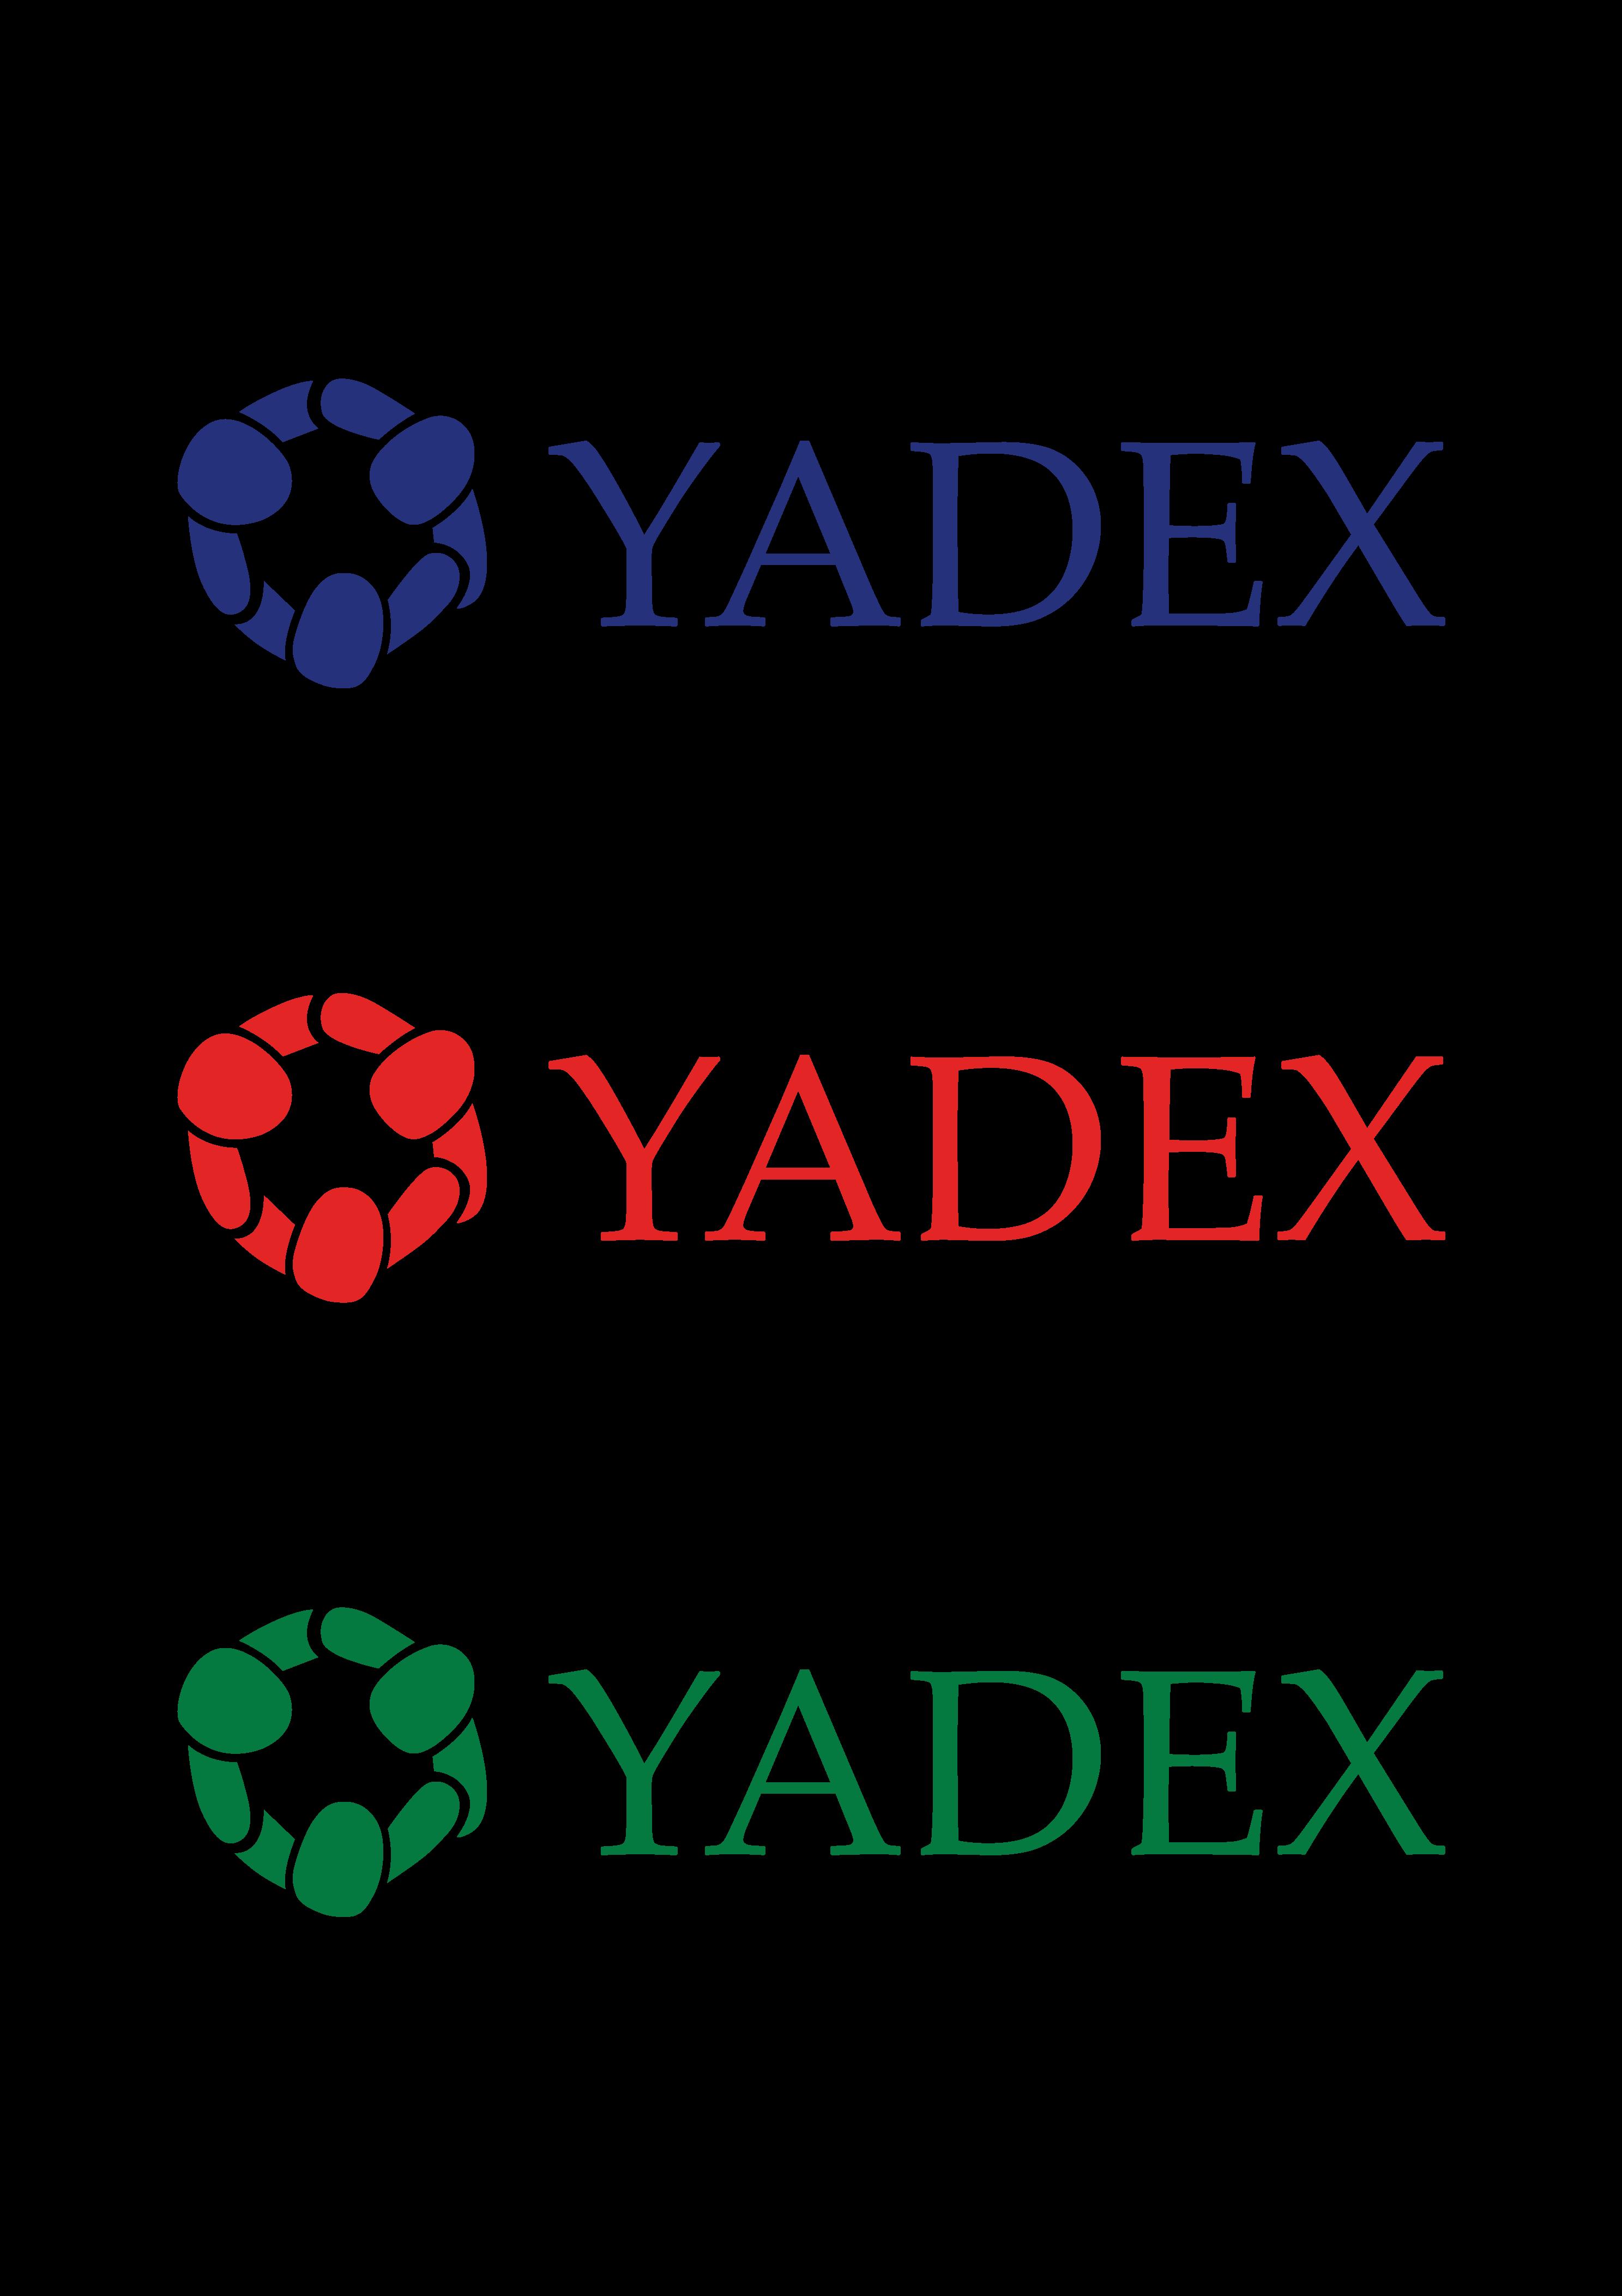 yadex_reverses_color.png